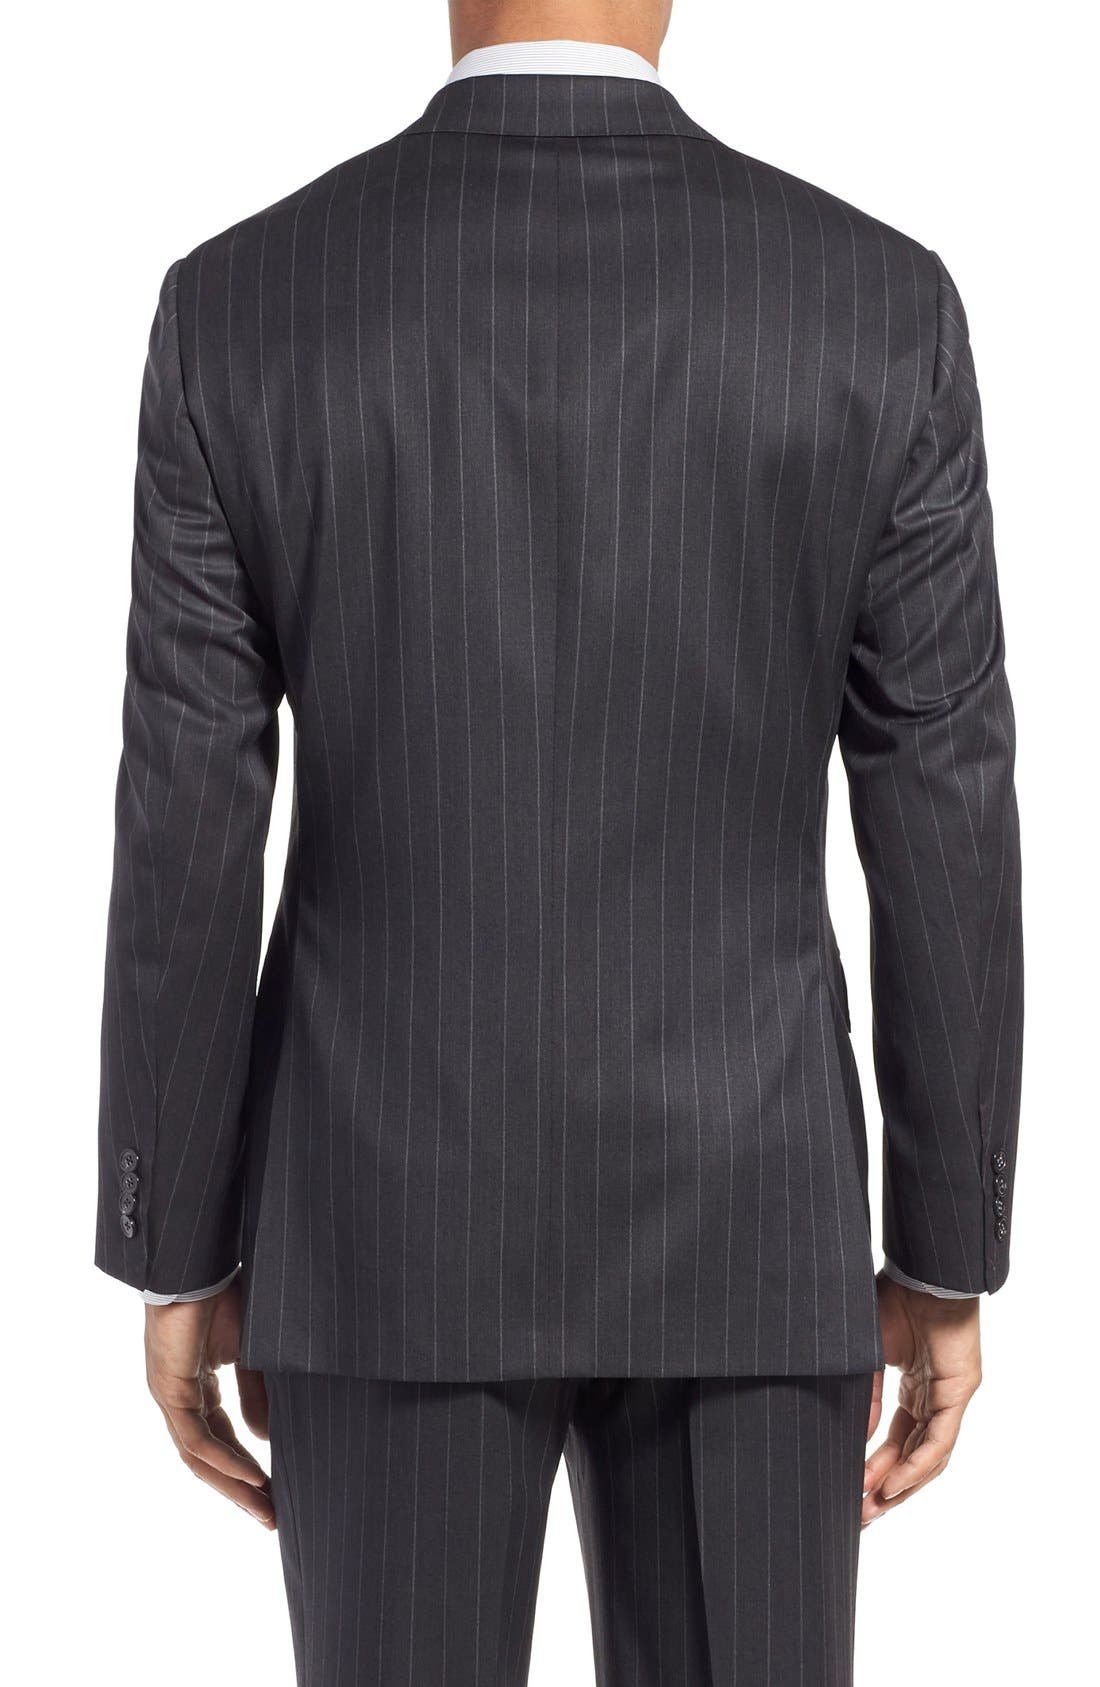 SAMUELSOHN, Classic Fit Stripe Wool Suit, Alternate thumbnail 6, color, 025